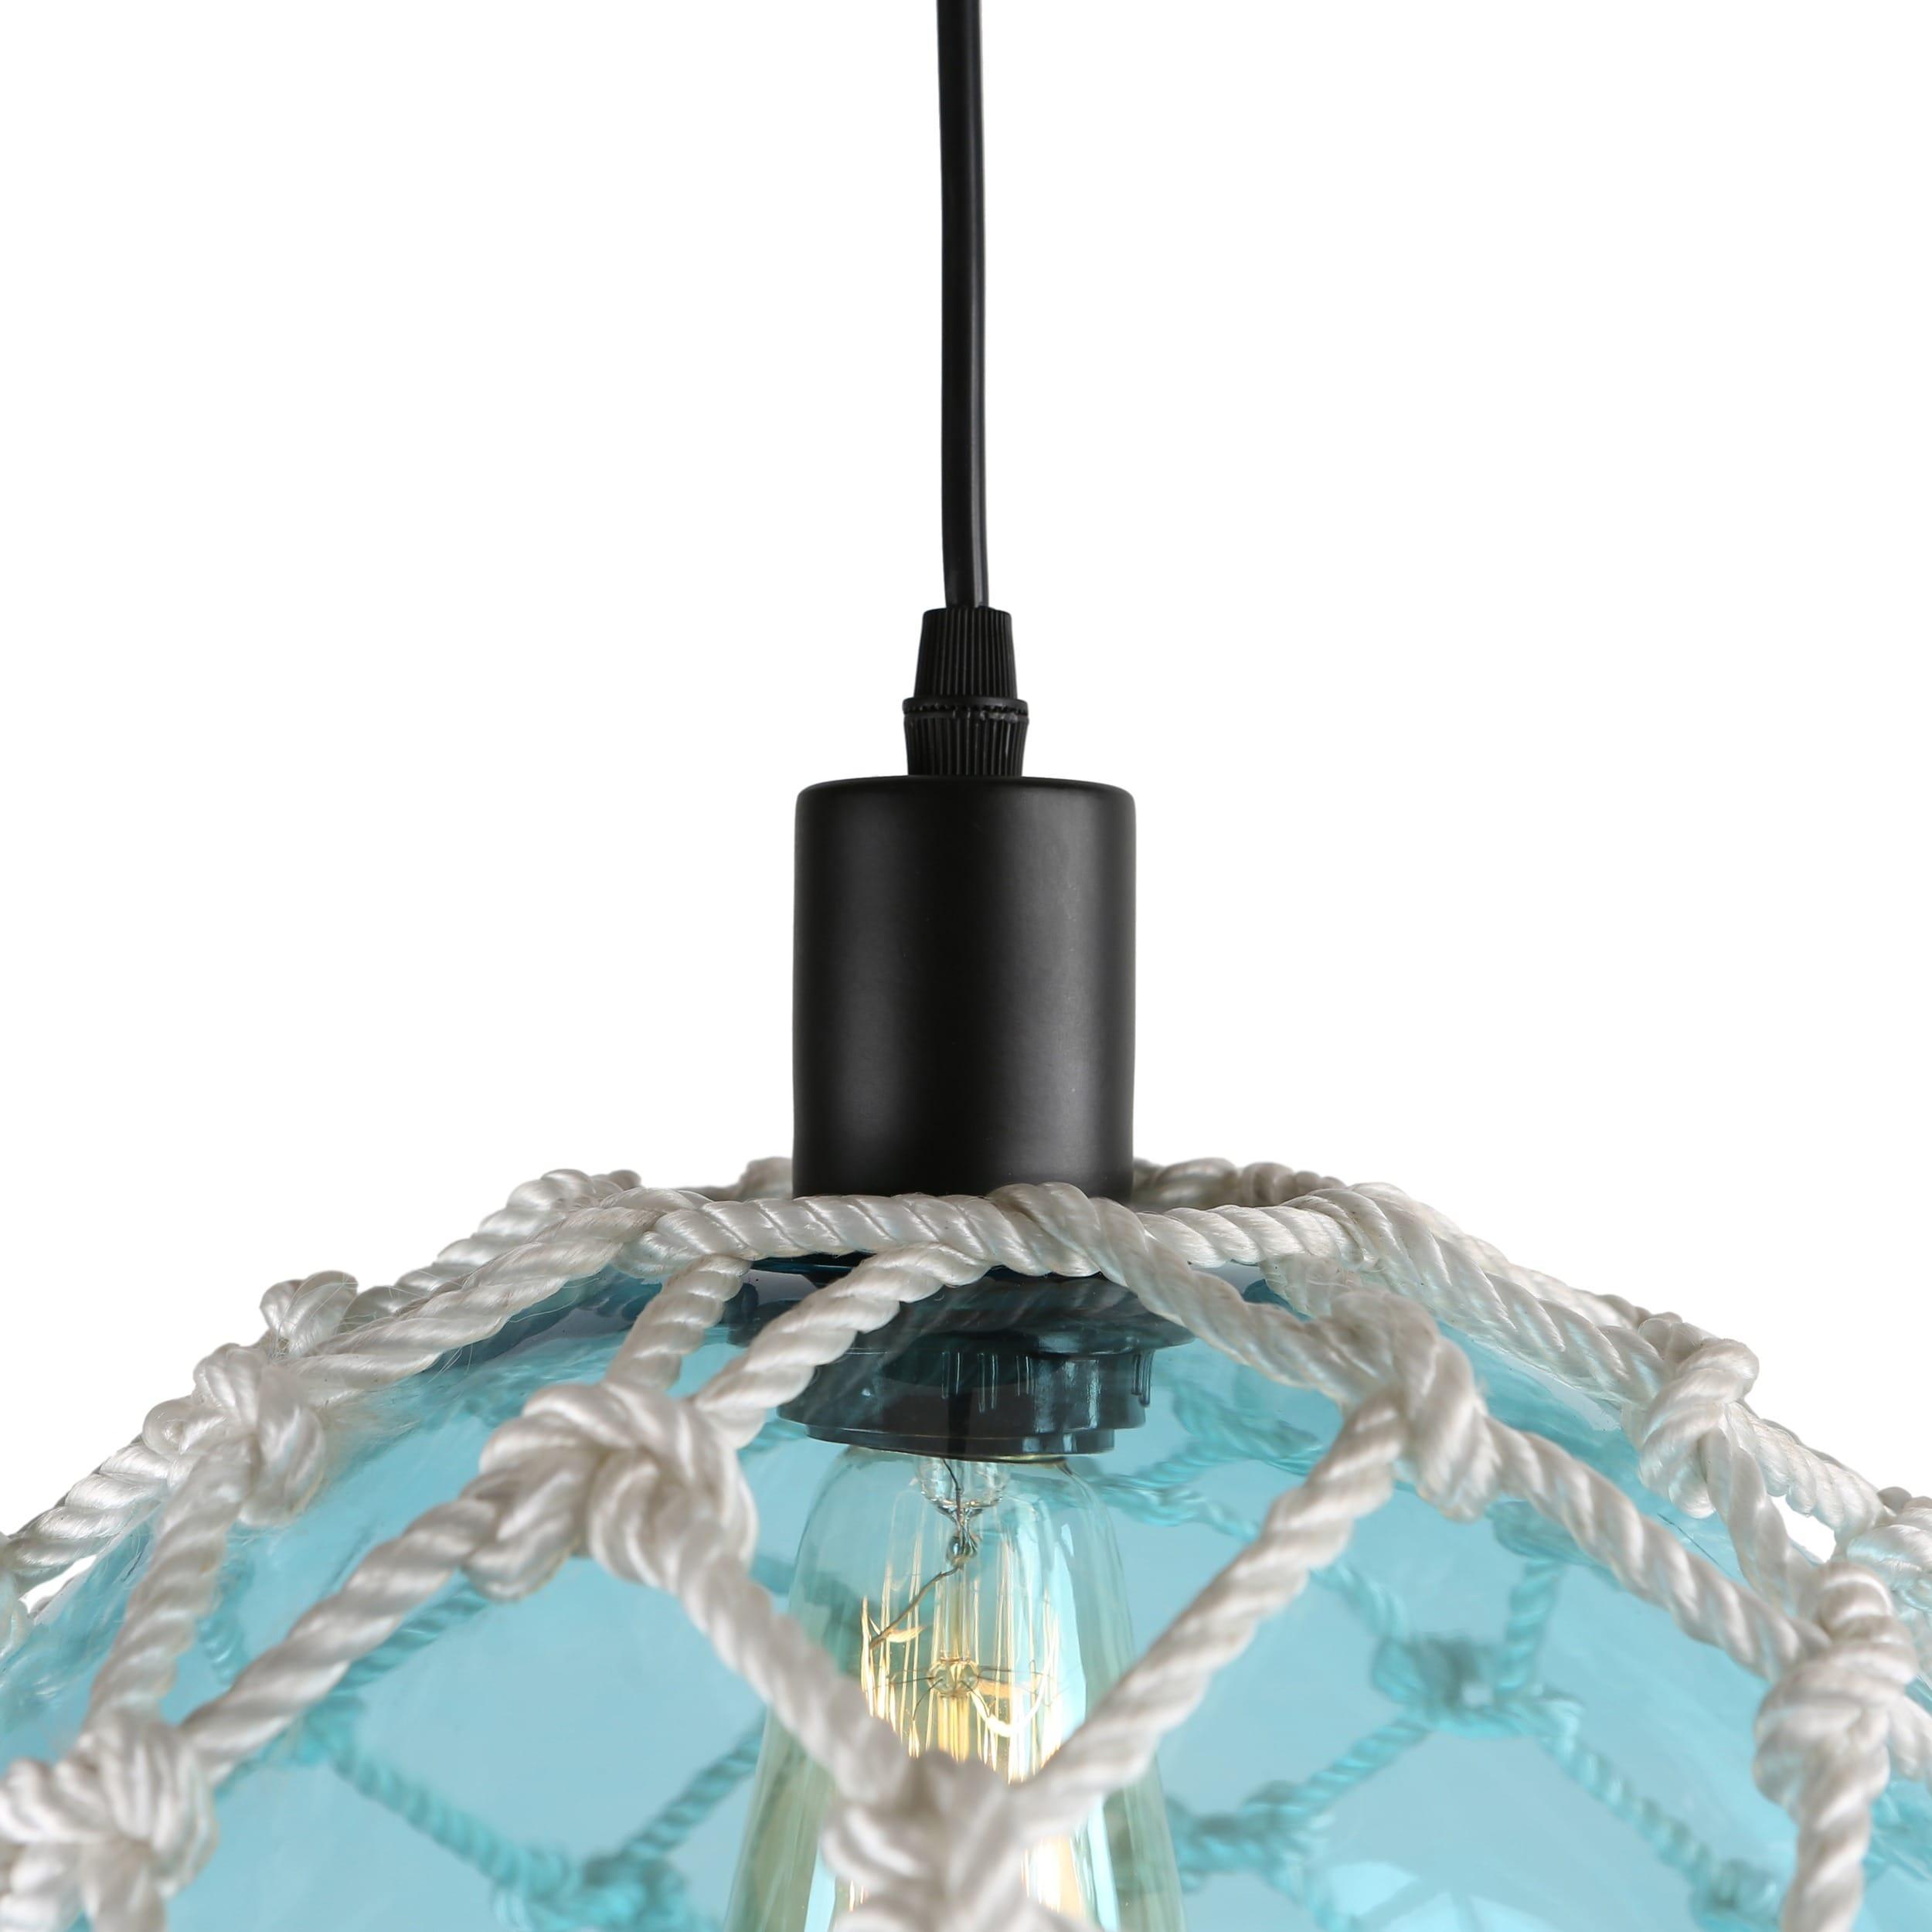 journee lighting. Journee Home \u0027Nura\u0027 8 In Hard Wired Glass Hemp Net Pendant Light - Free Shipping Today Overstock 24186469 Lighting S